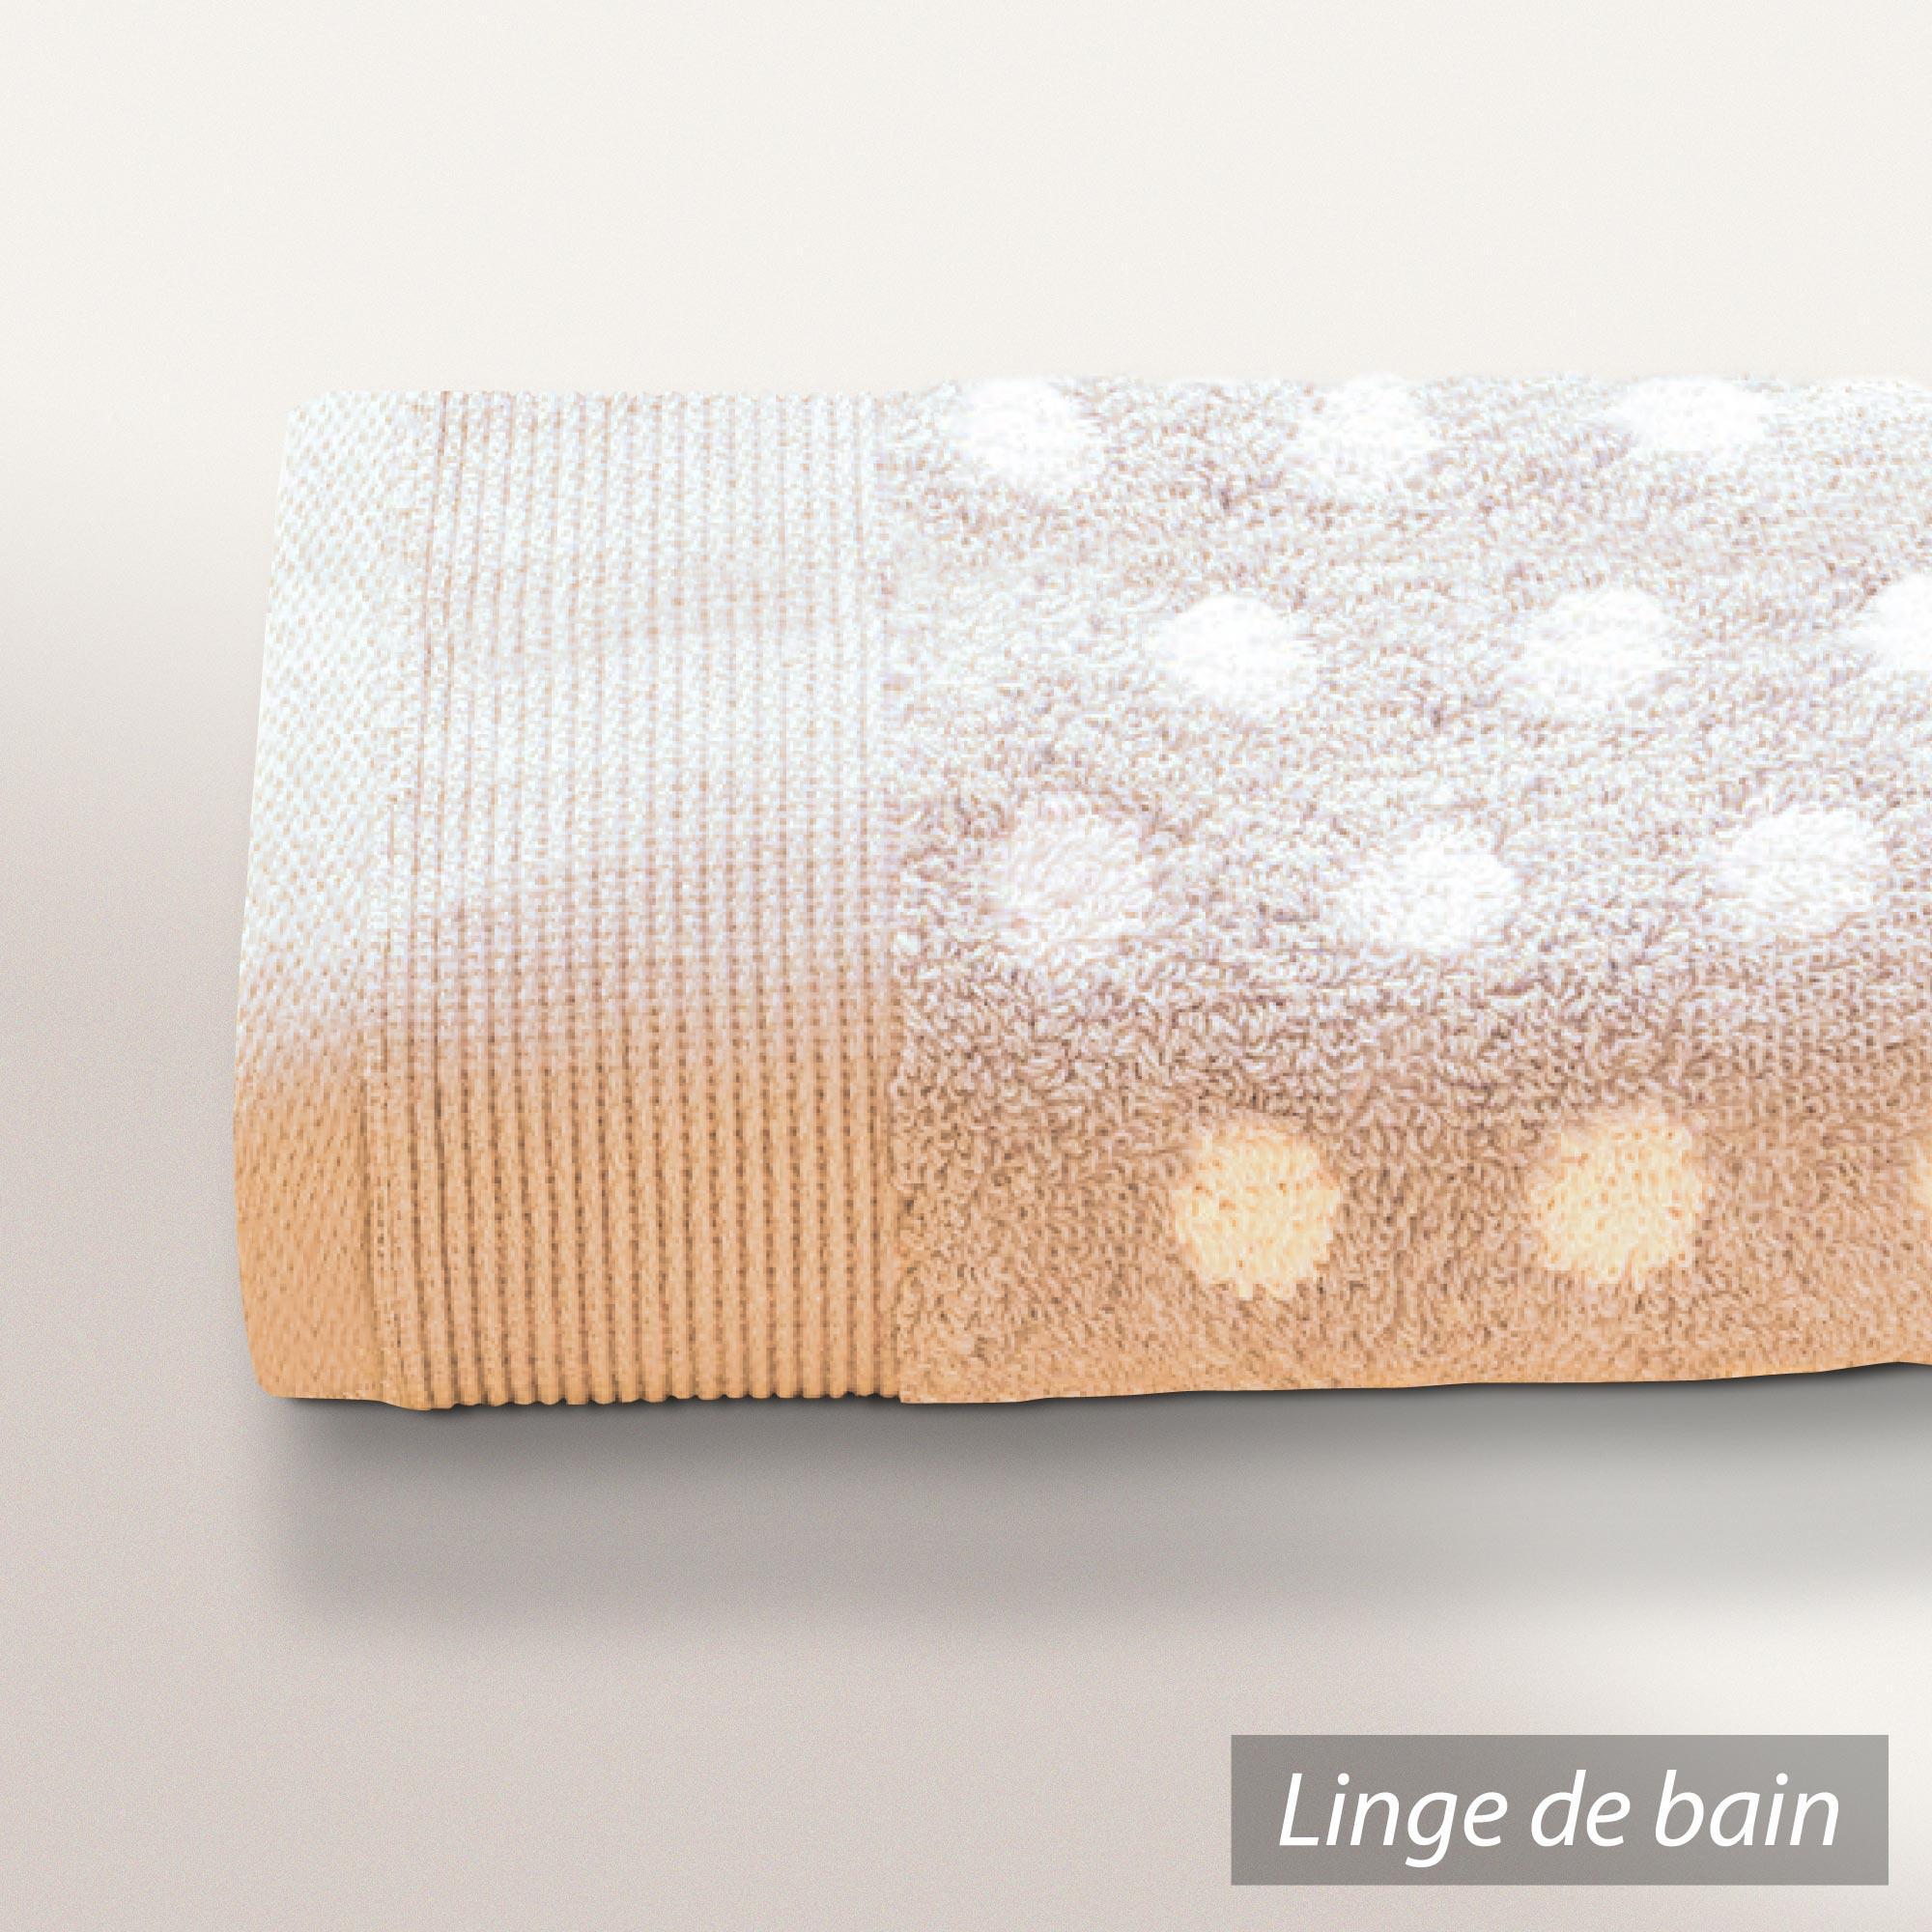 drap de bain 100x150cm uni coton domino beige linnea. Black Bedroom Furniture Sets. Home Design Ideas